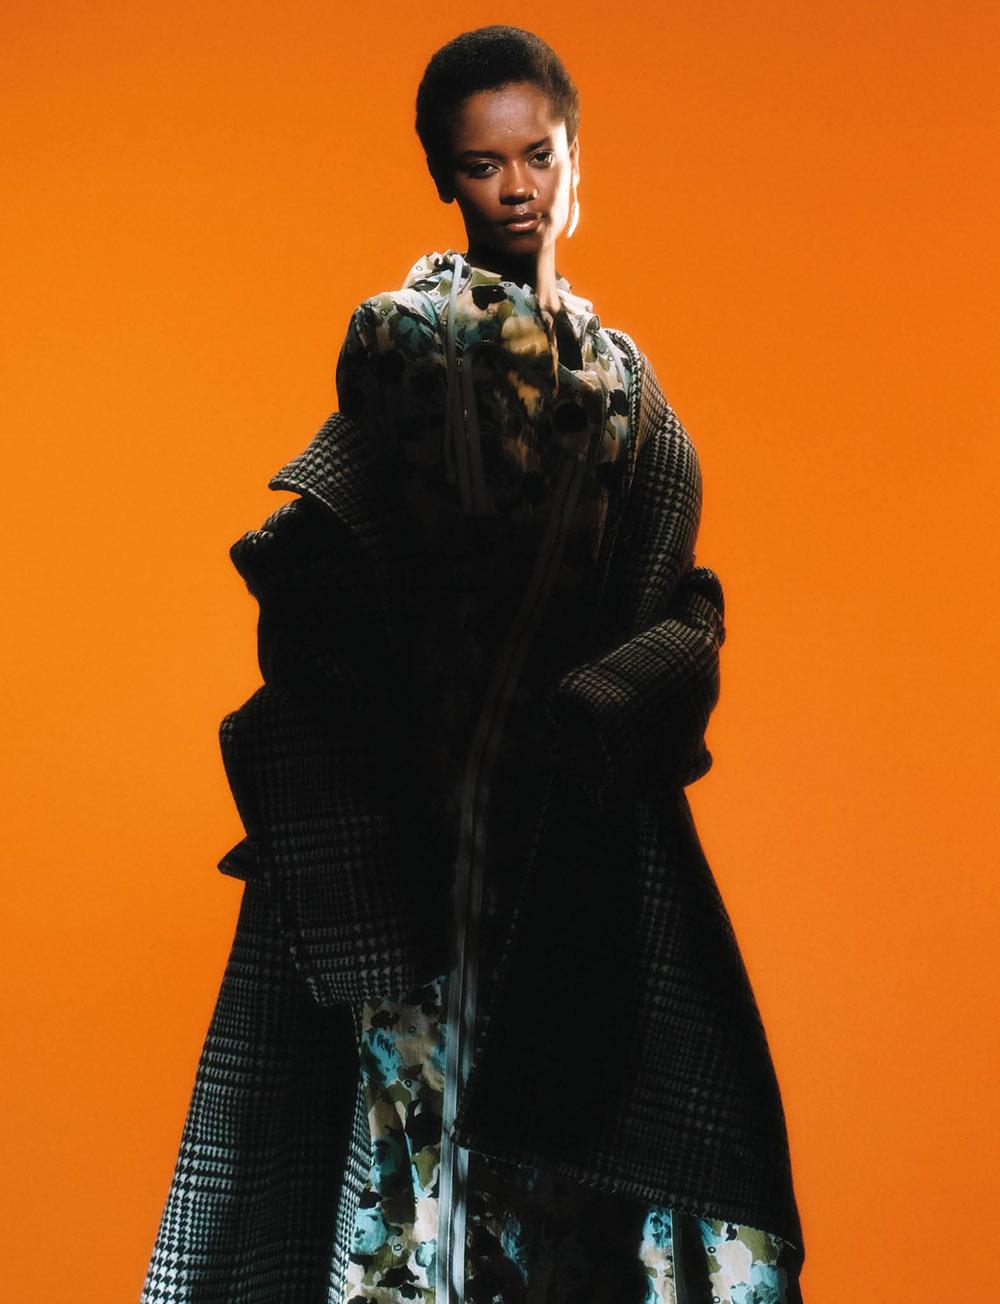 Letitia Wright covers Dazed Magazine Autumn Winter 2020 by Arnaud Lajeunie